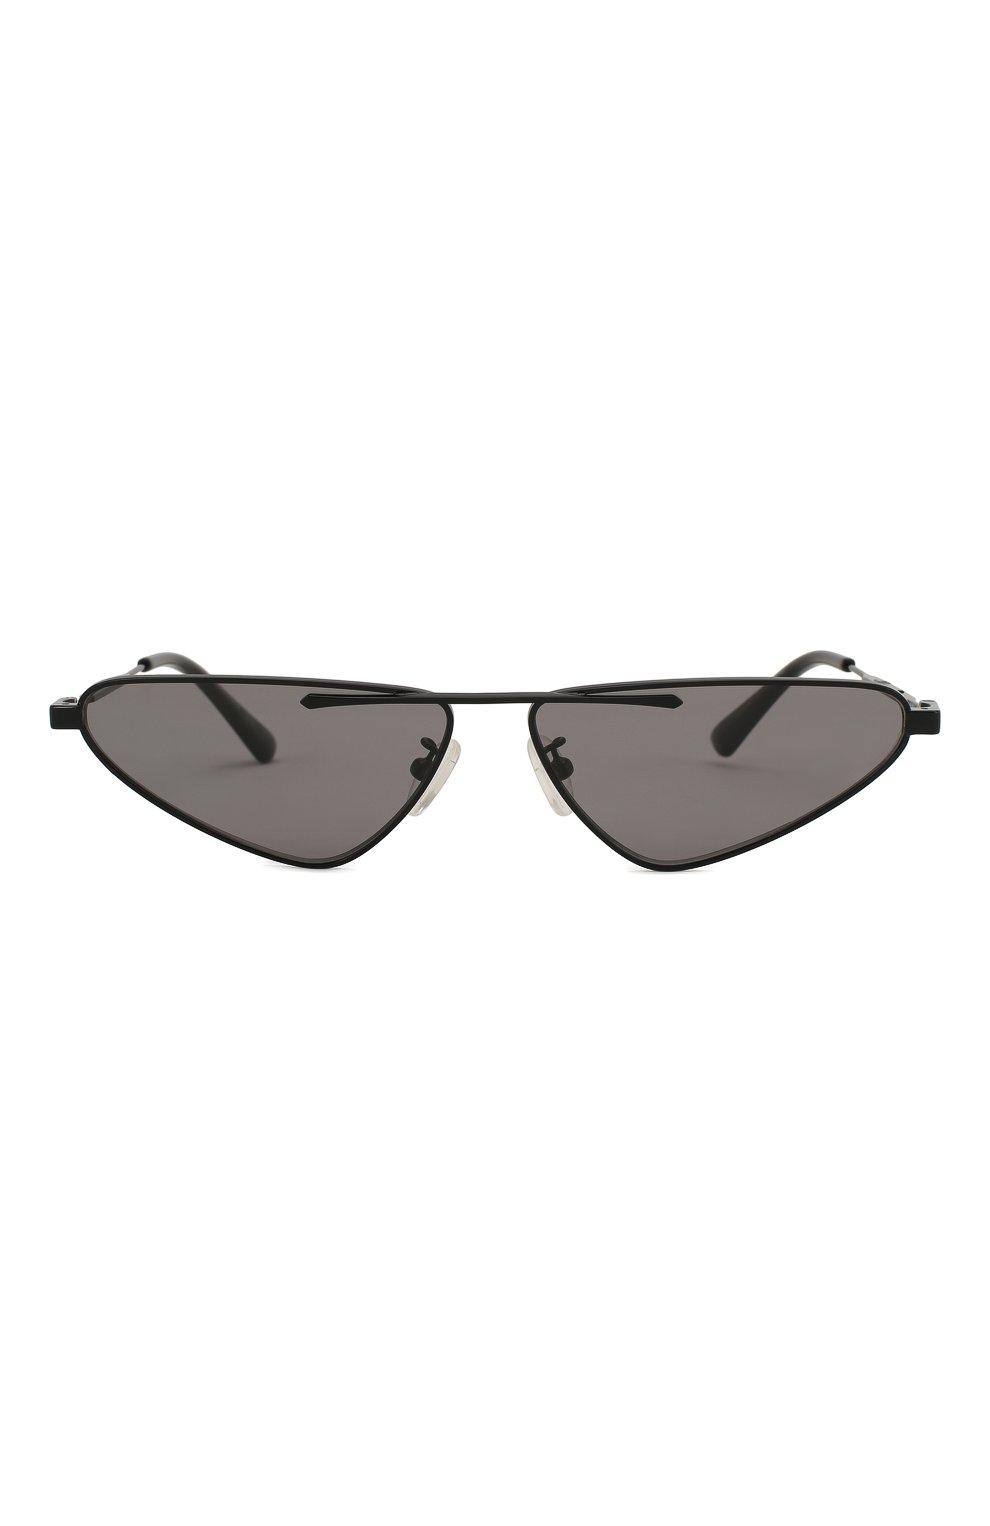 Женские солнцезащитные очки MCQ SWALLOW черного цвета, арт. MQ0226 001 | Фото 4